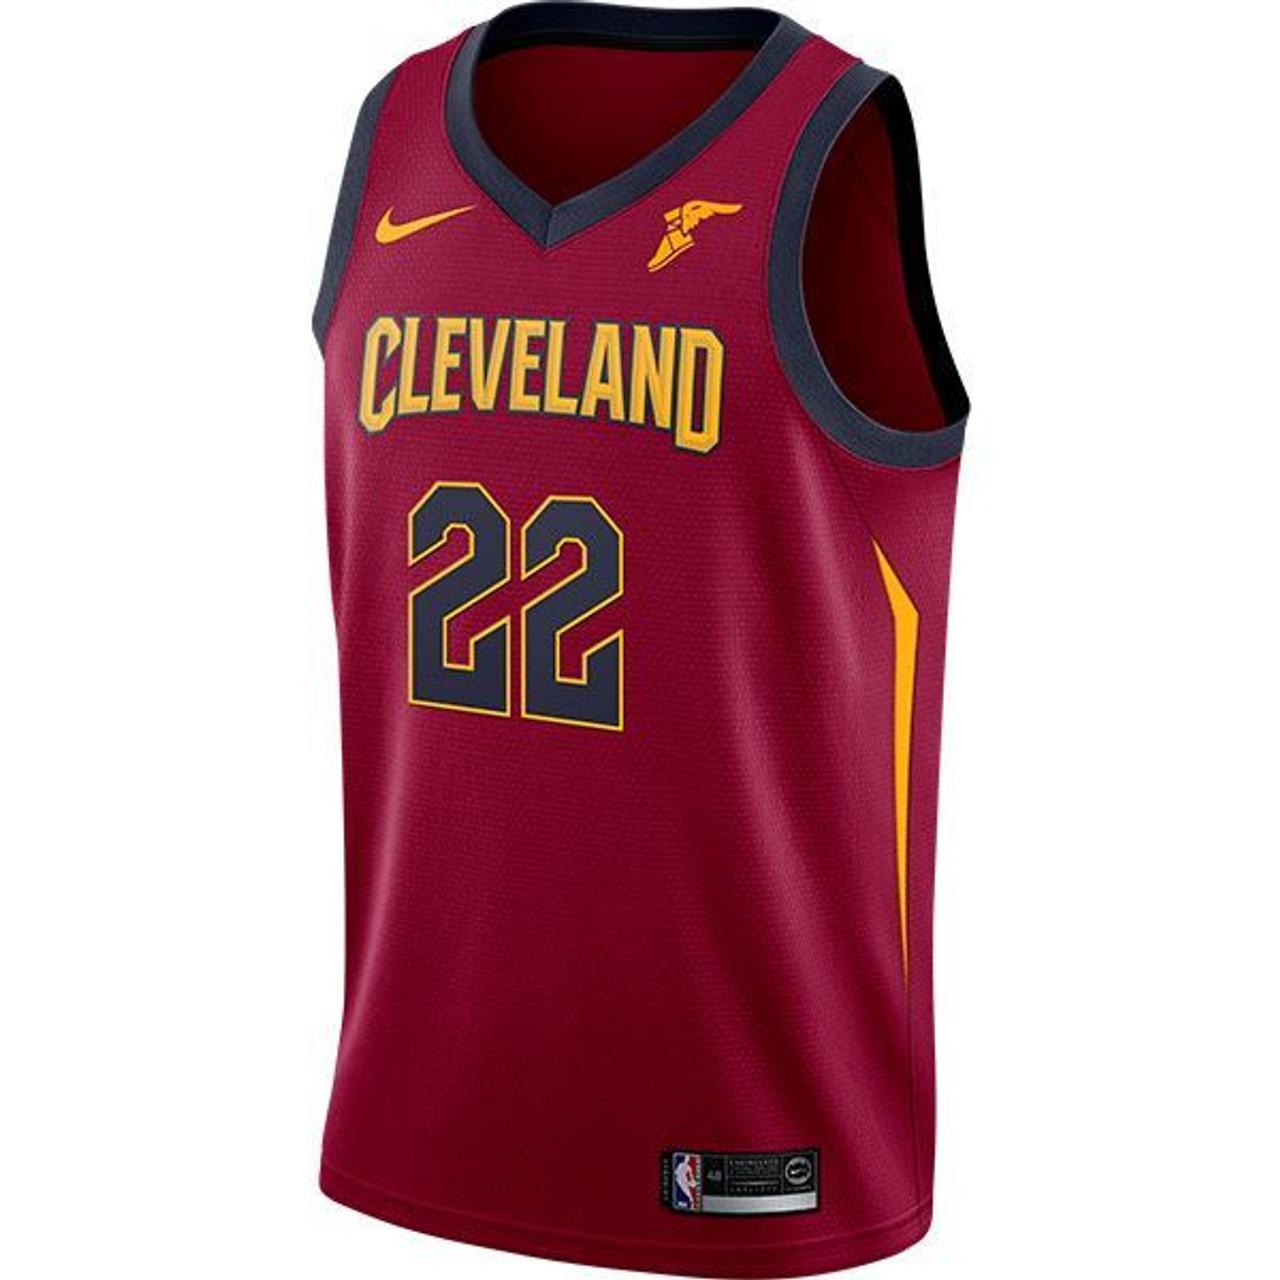 3ed19332c2a  22 Larry Nance Jr. Icon Jersey  Wingfoot Patch  - Cleveland Cavaliers Team  Shop